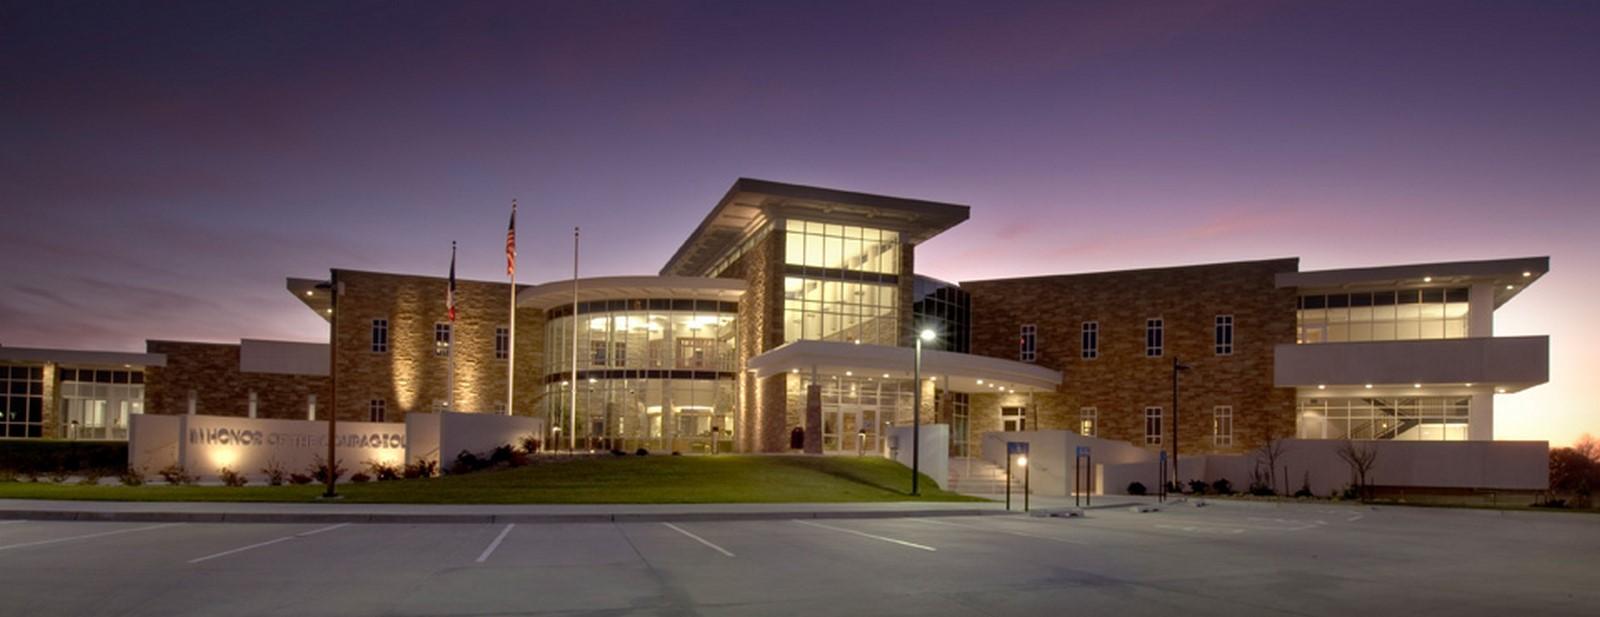 Architects in Kansas city - Top 90 Architects in Kansas city - Sheet64